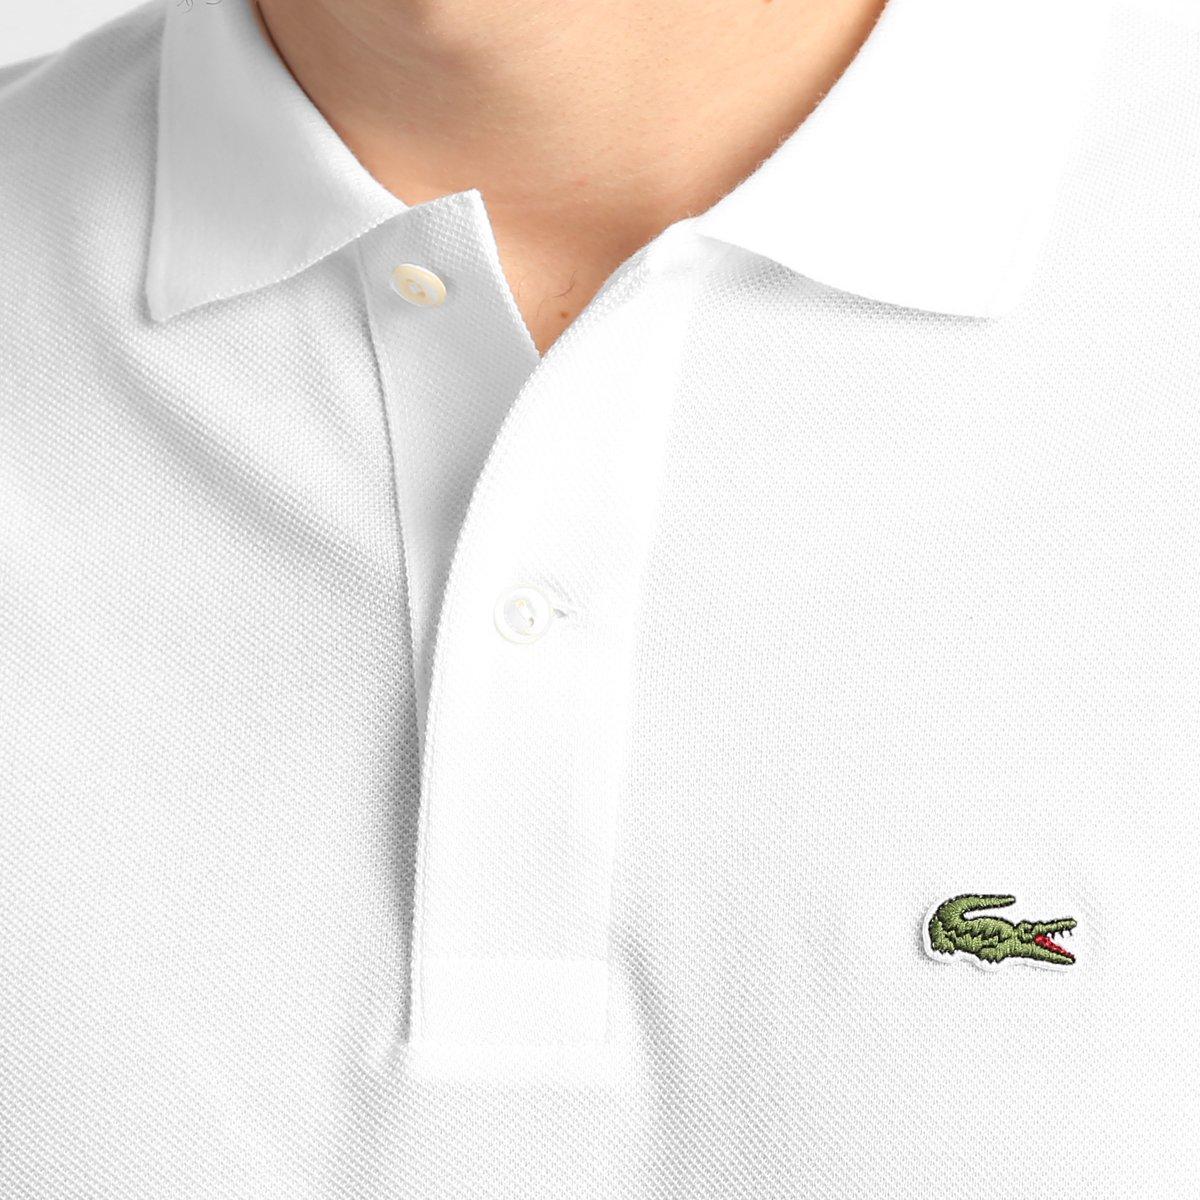 d28bf529e5954 Camisa Polo Lacoste Original Fit Masculina - Branco - Compre Agora ...